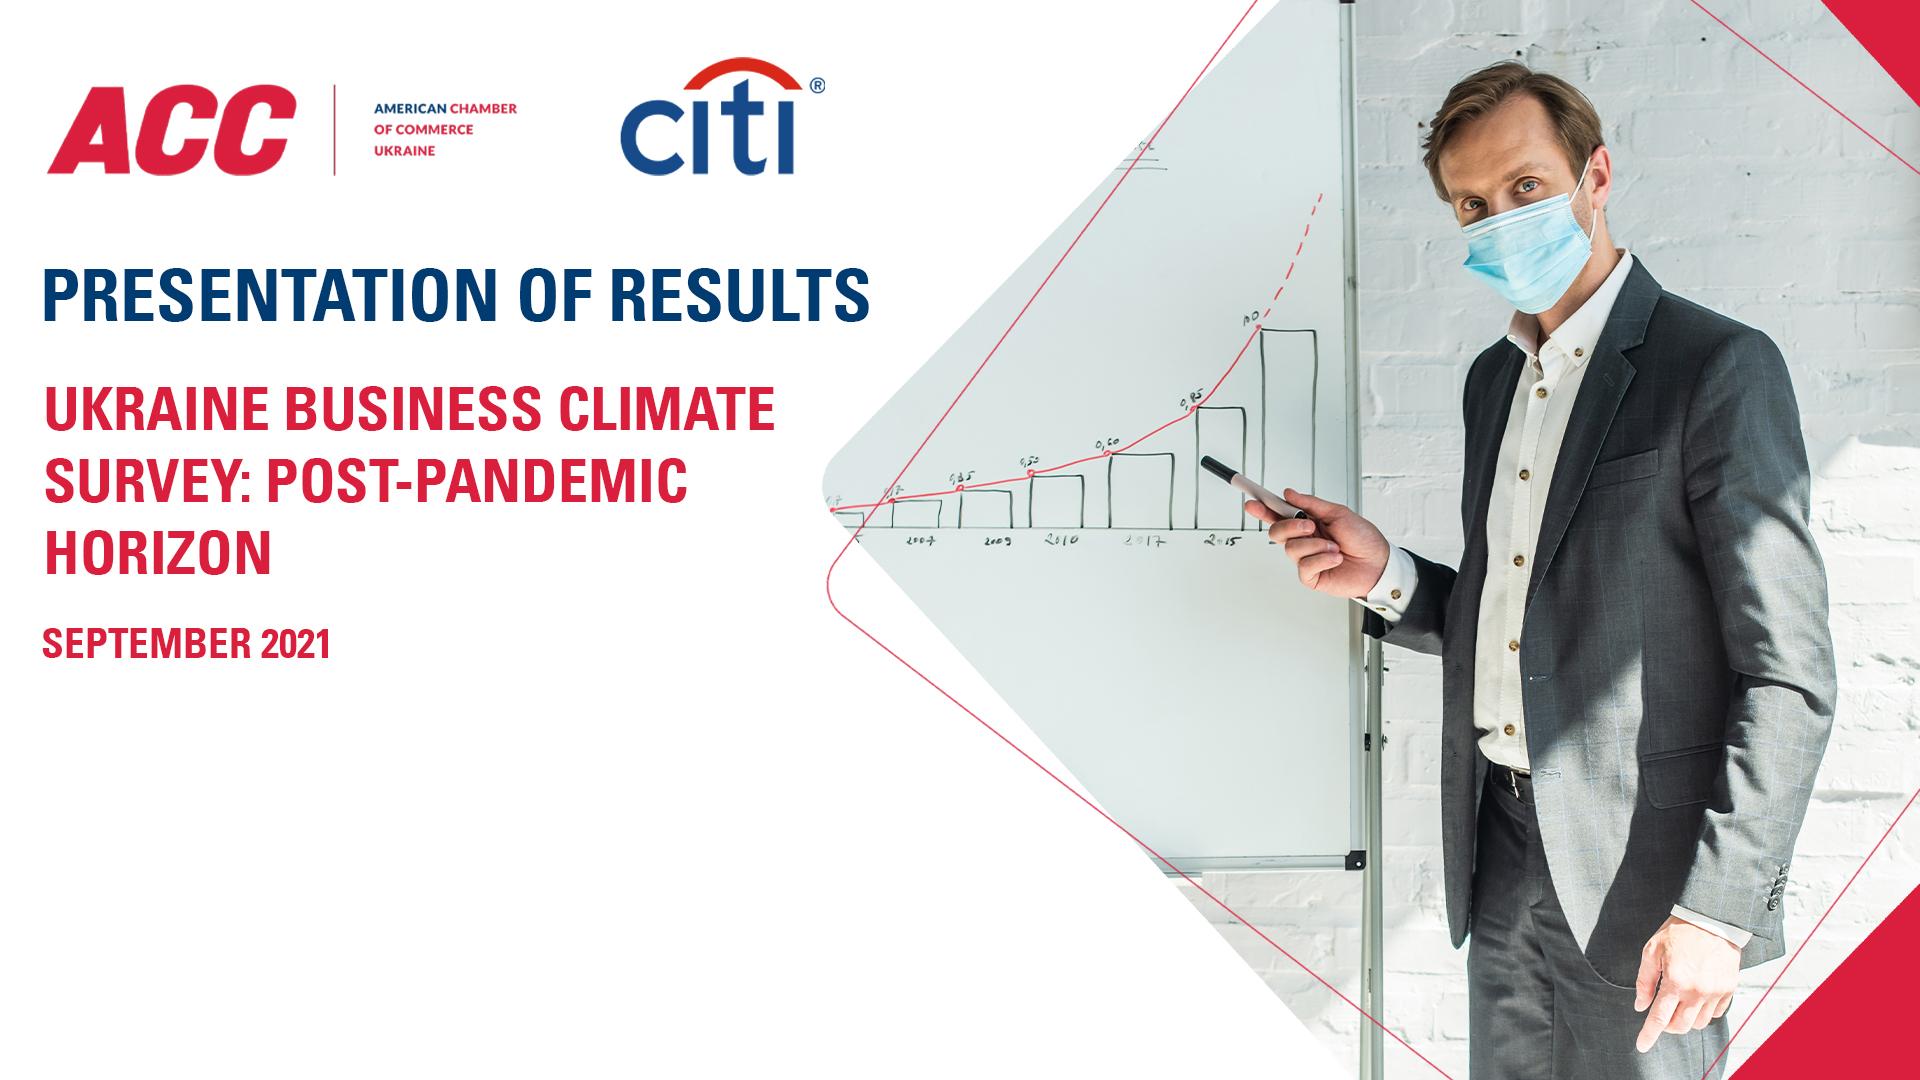 Presentation of Results: Ukraine Business Climate Survey. Post-Pandemic Horizon